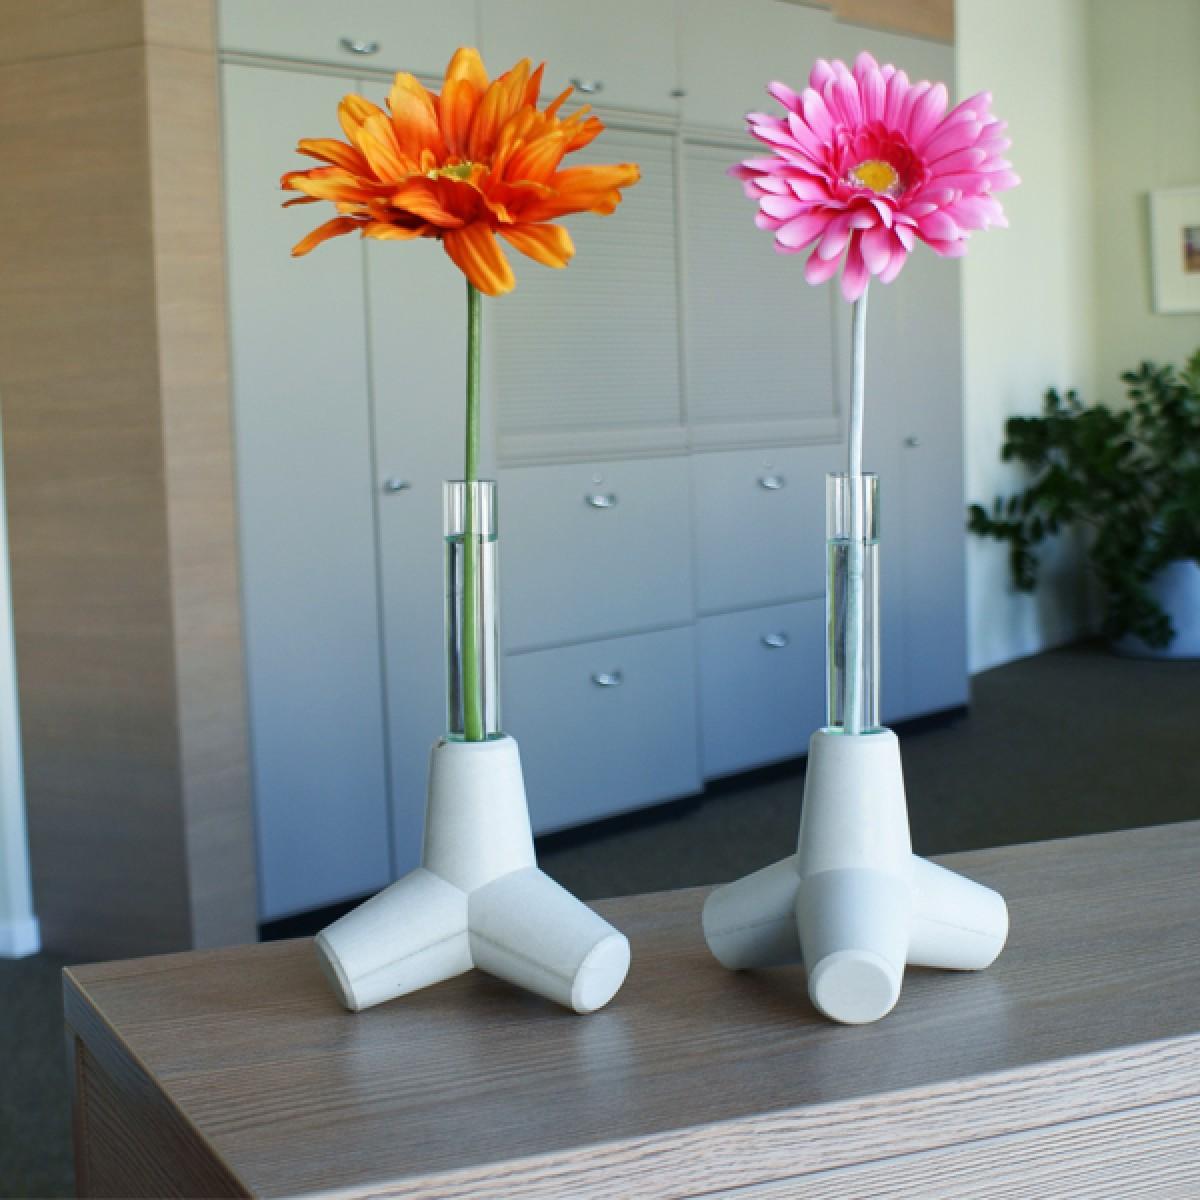 2er Set Sylpo - Kerzenhalter, Vase & Küstenschutz